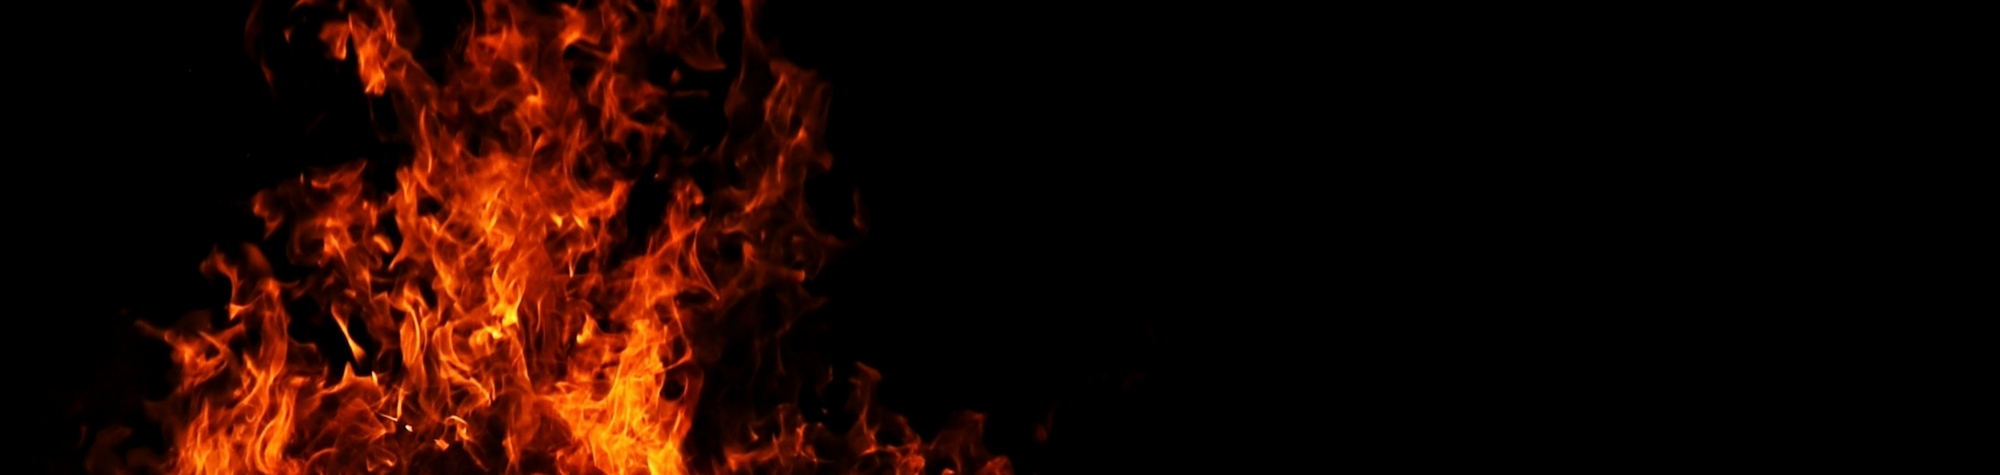 Volcore beats the Fire Penetration Test